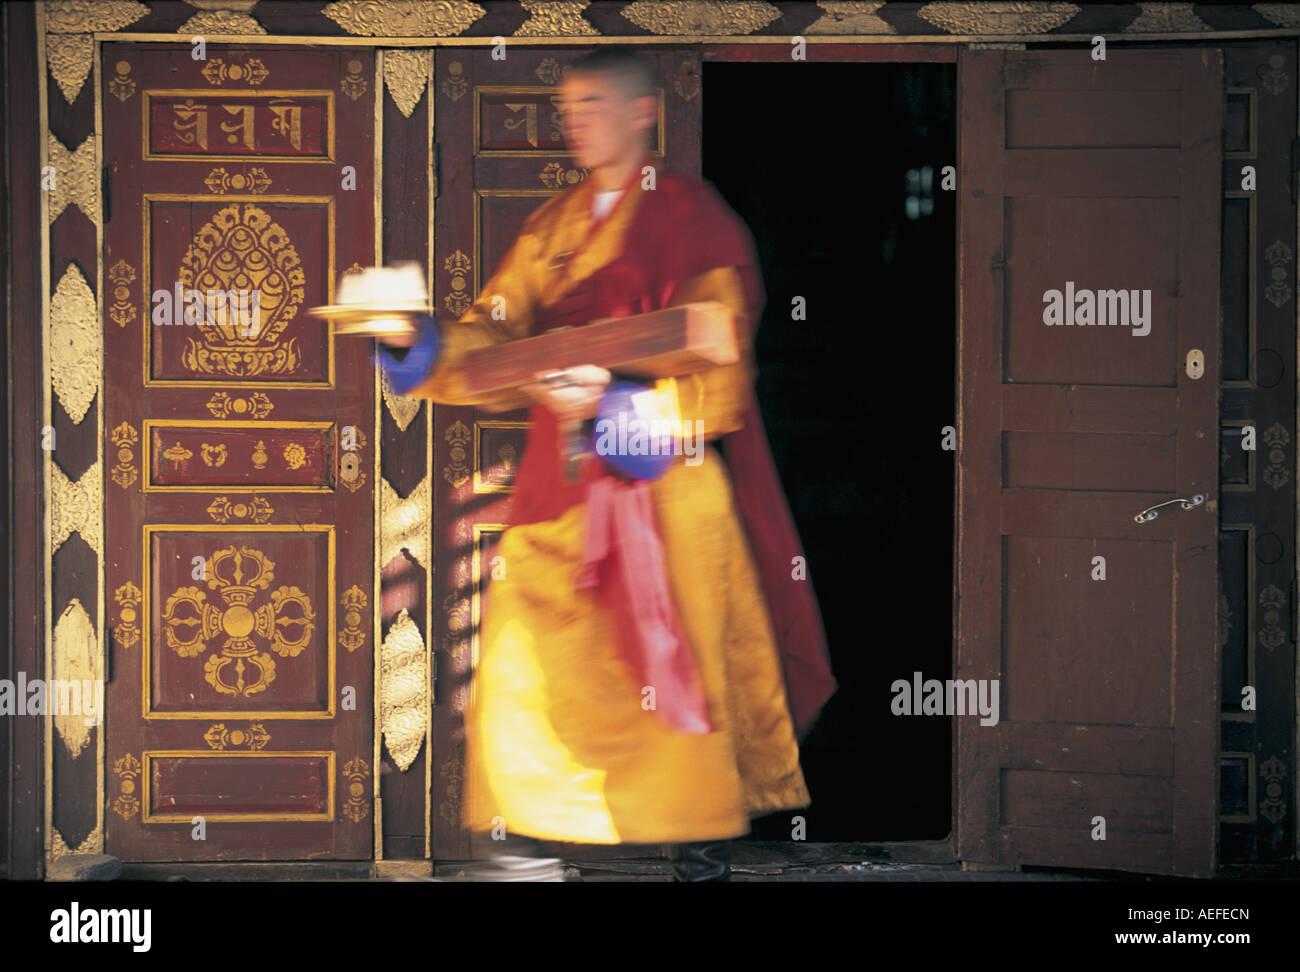 Gandan Khiid Monastery Ulaan Baatar Mongolia - Stock Image